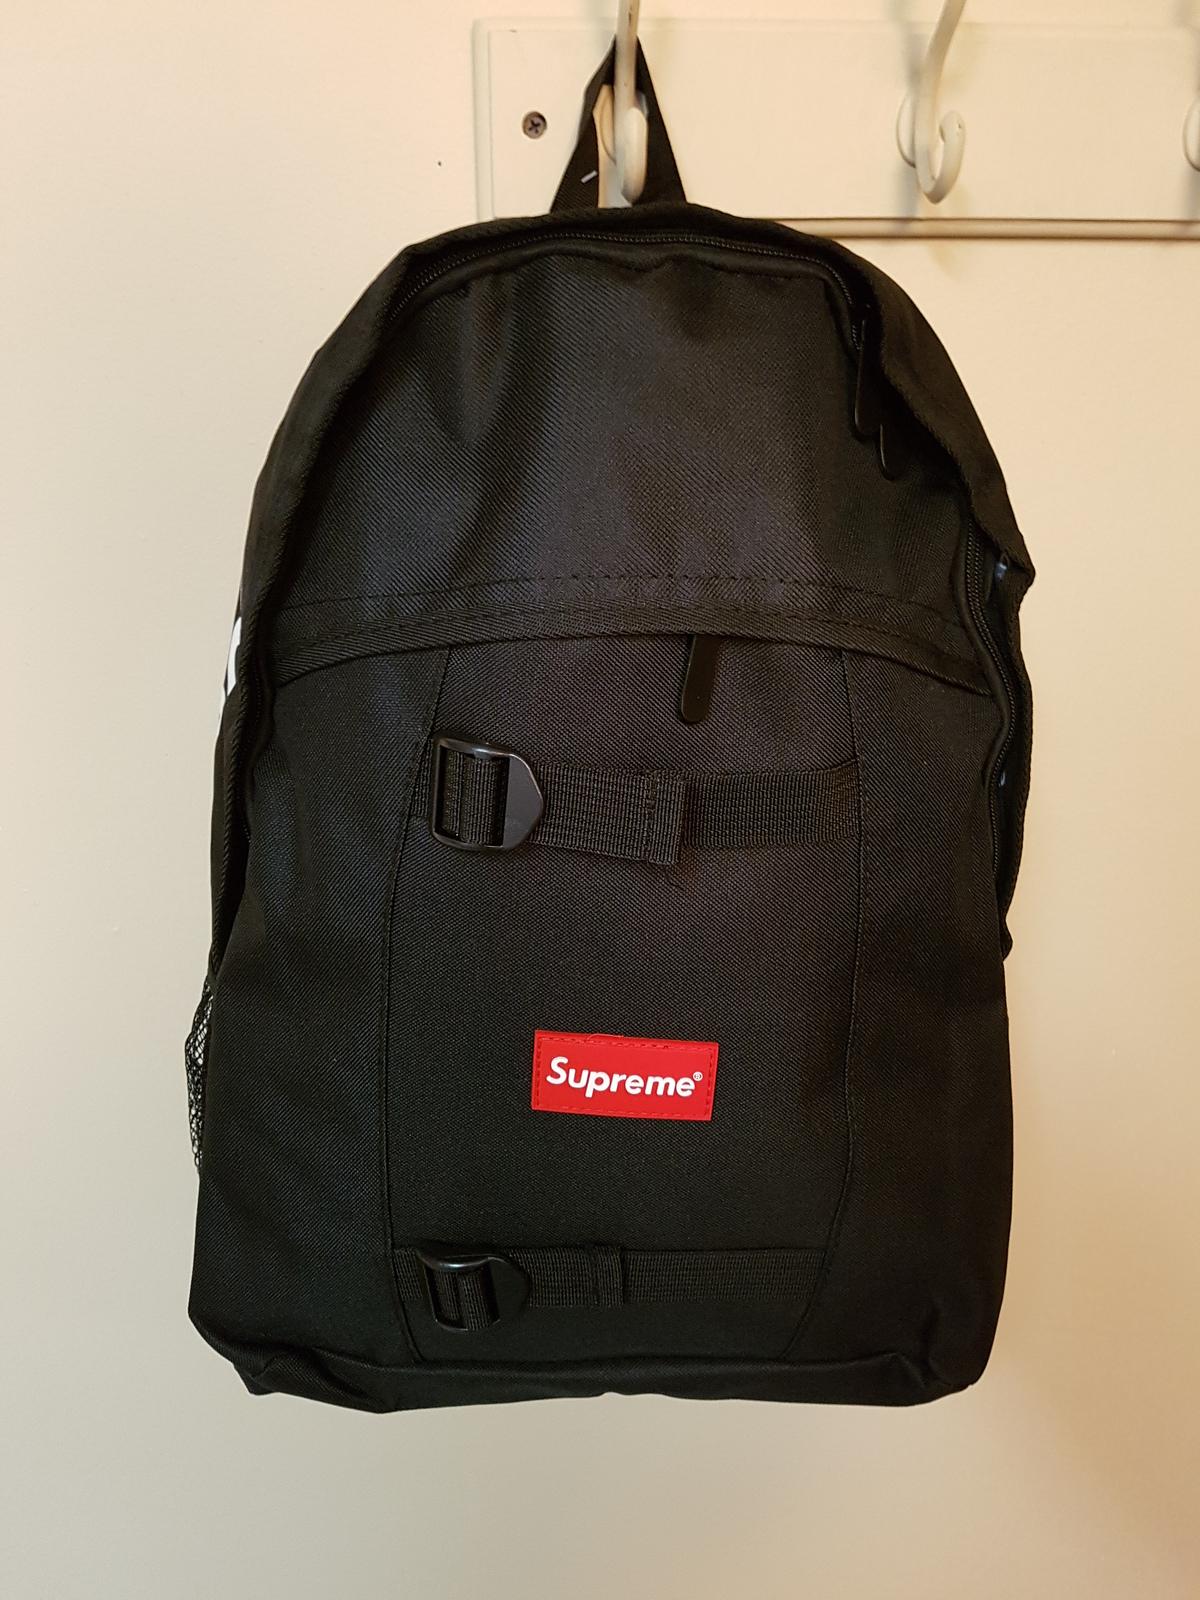 4a514cbaa Supreme Backpack Bag Box Logo School and 18 similar items